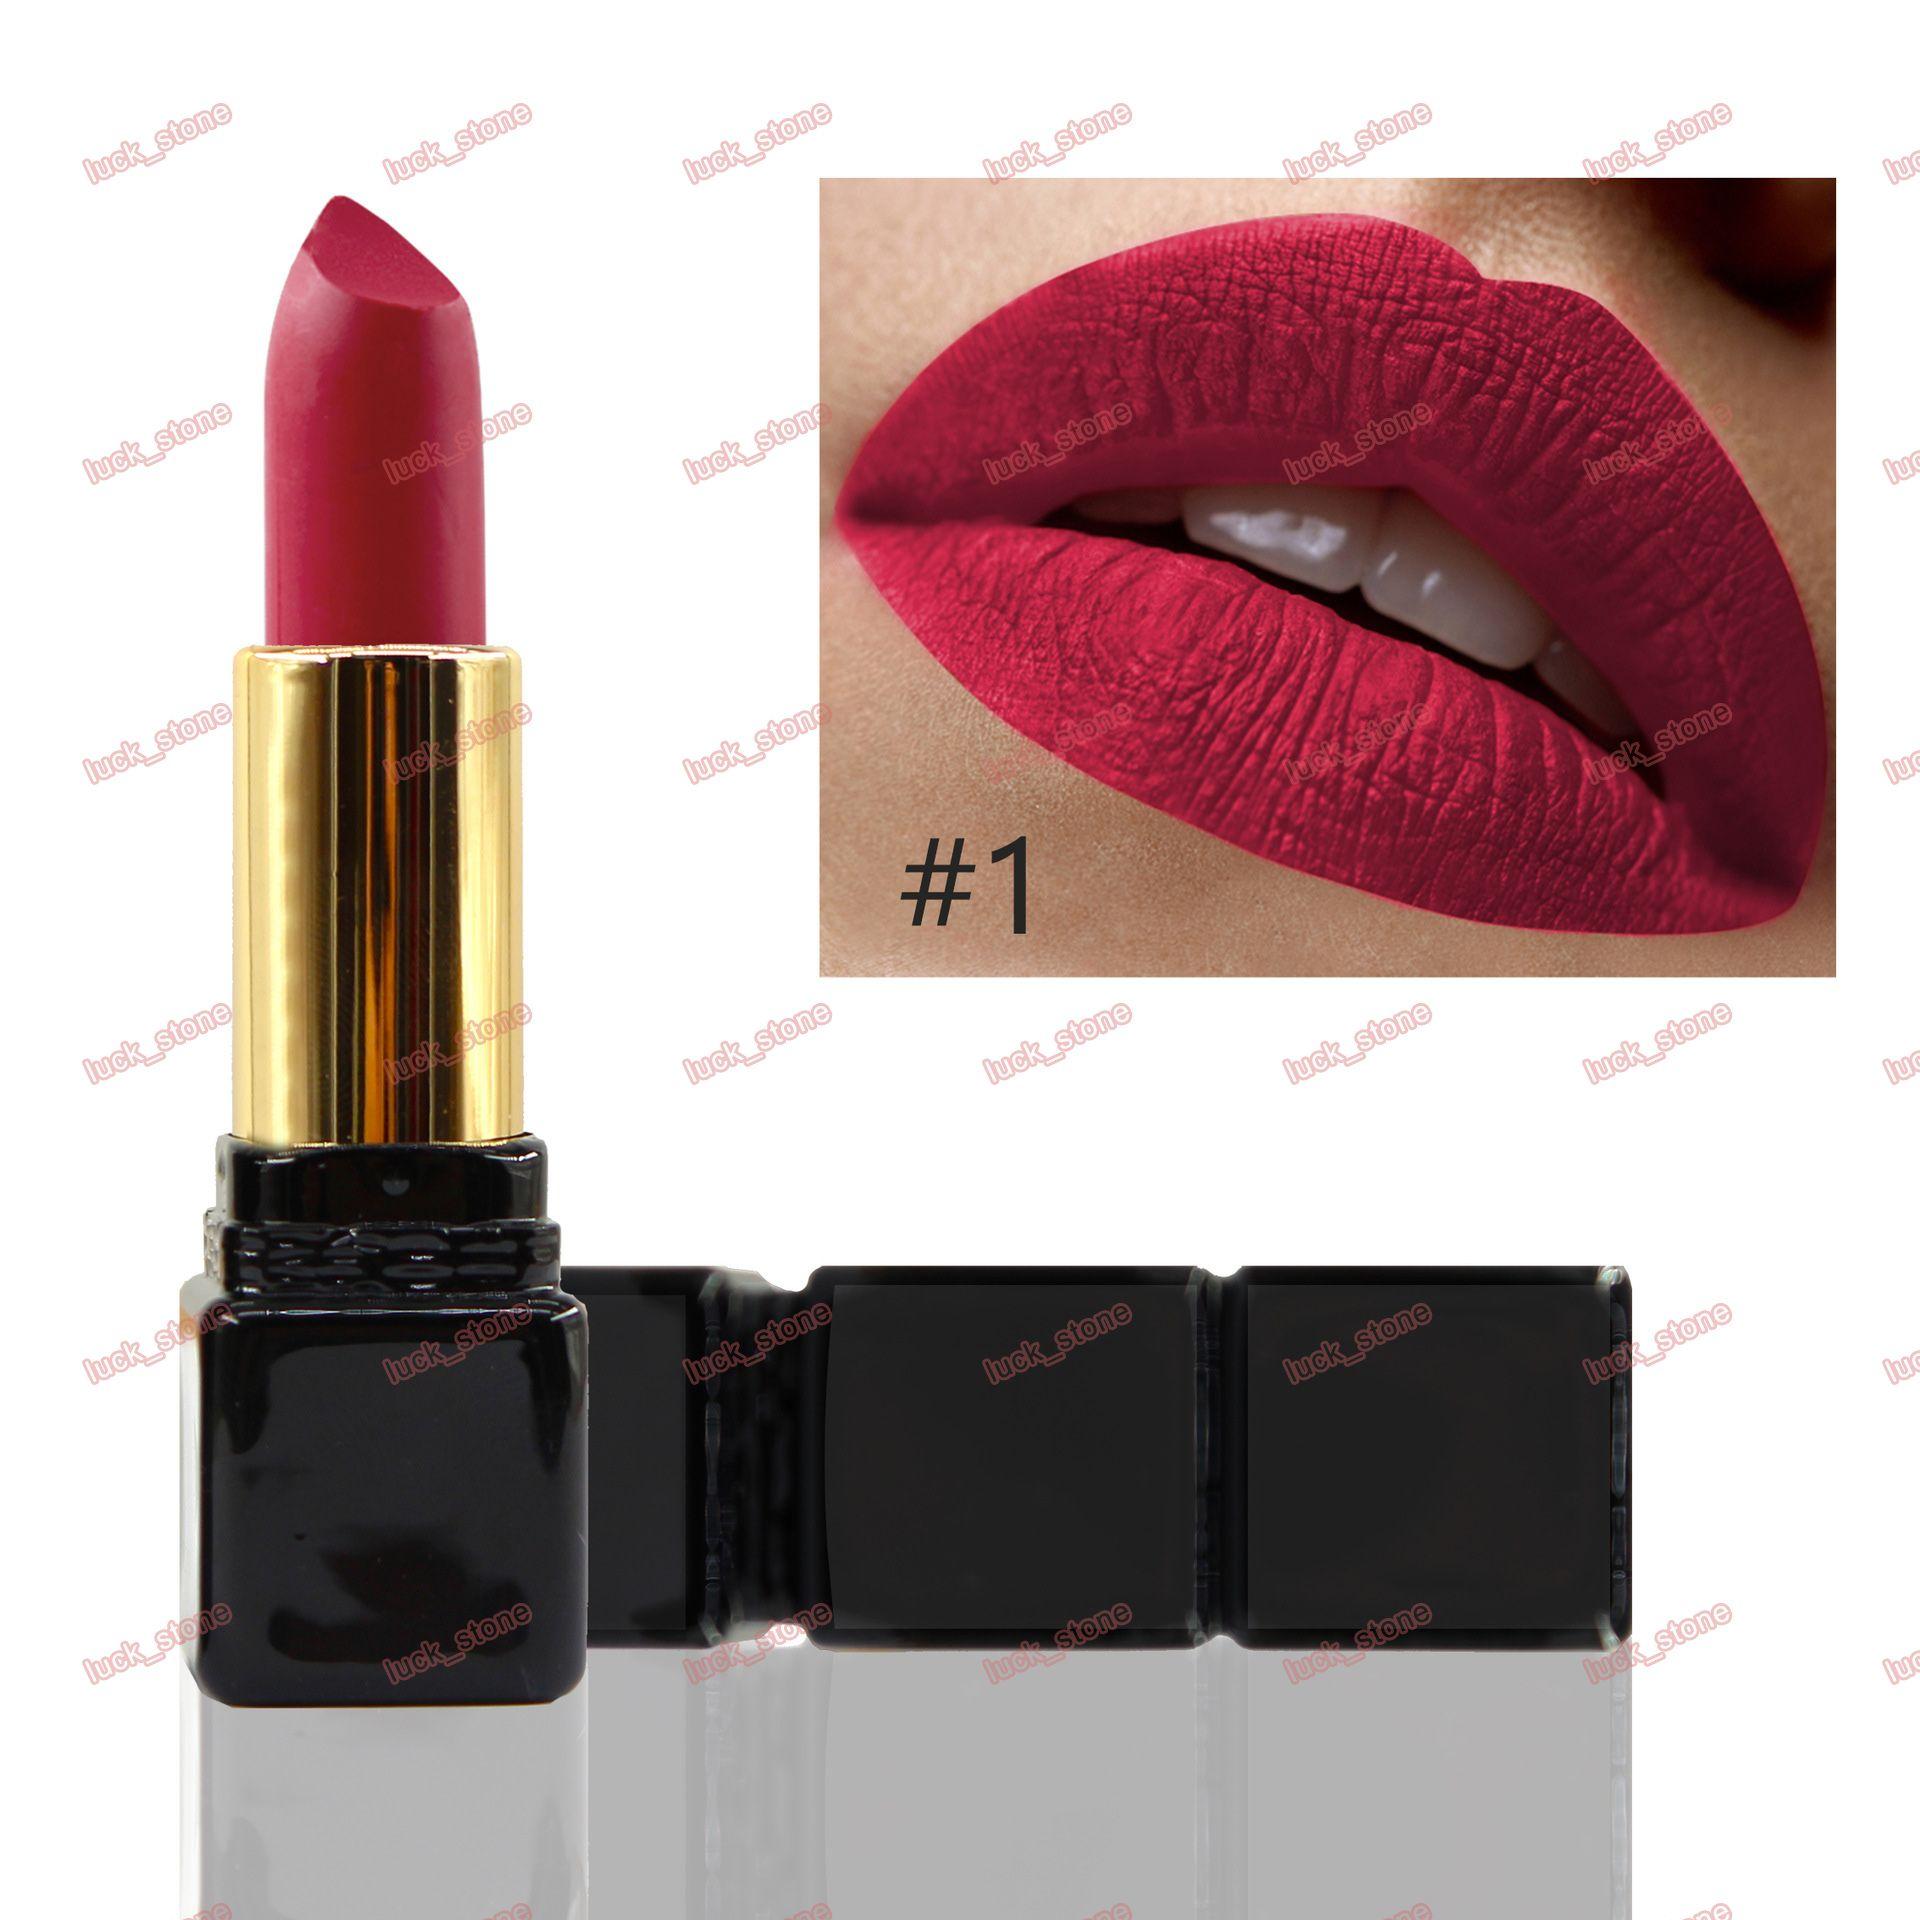 matt lipstick matte lip rouge non-stick cup long lasting no logo cosmetics black tube dayly makeup